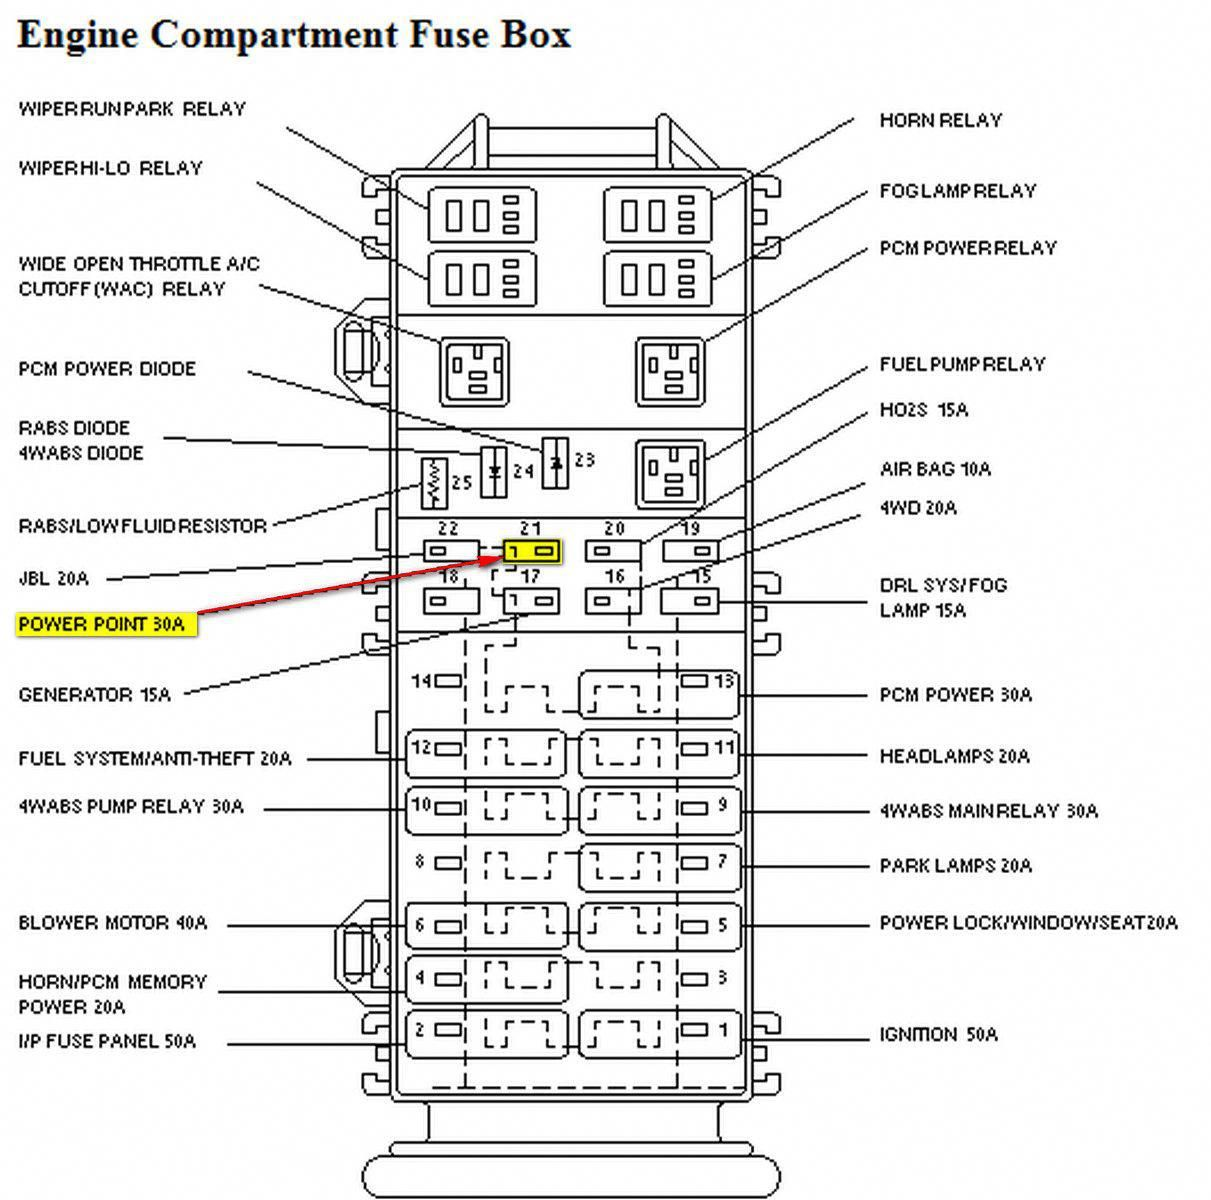 1997 ford ranger fuse box diagram truck part diagrams [ 1211 x 1200 Pixel ]